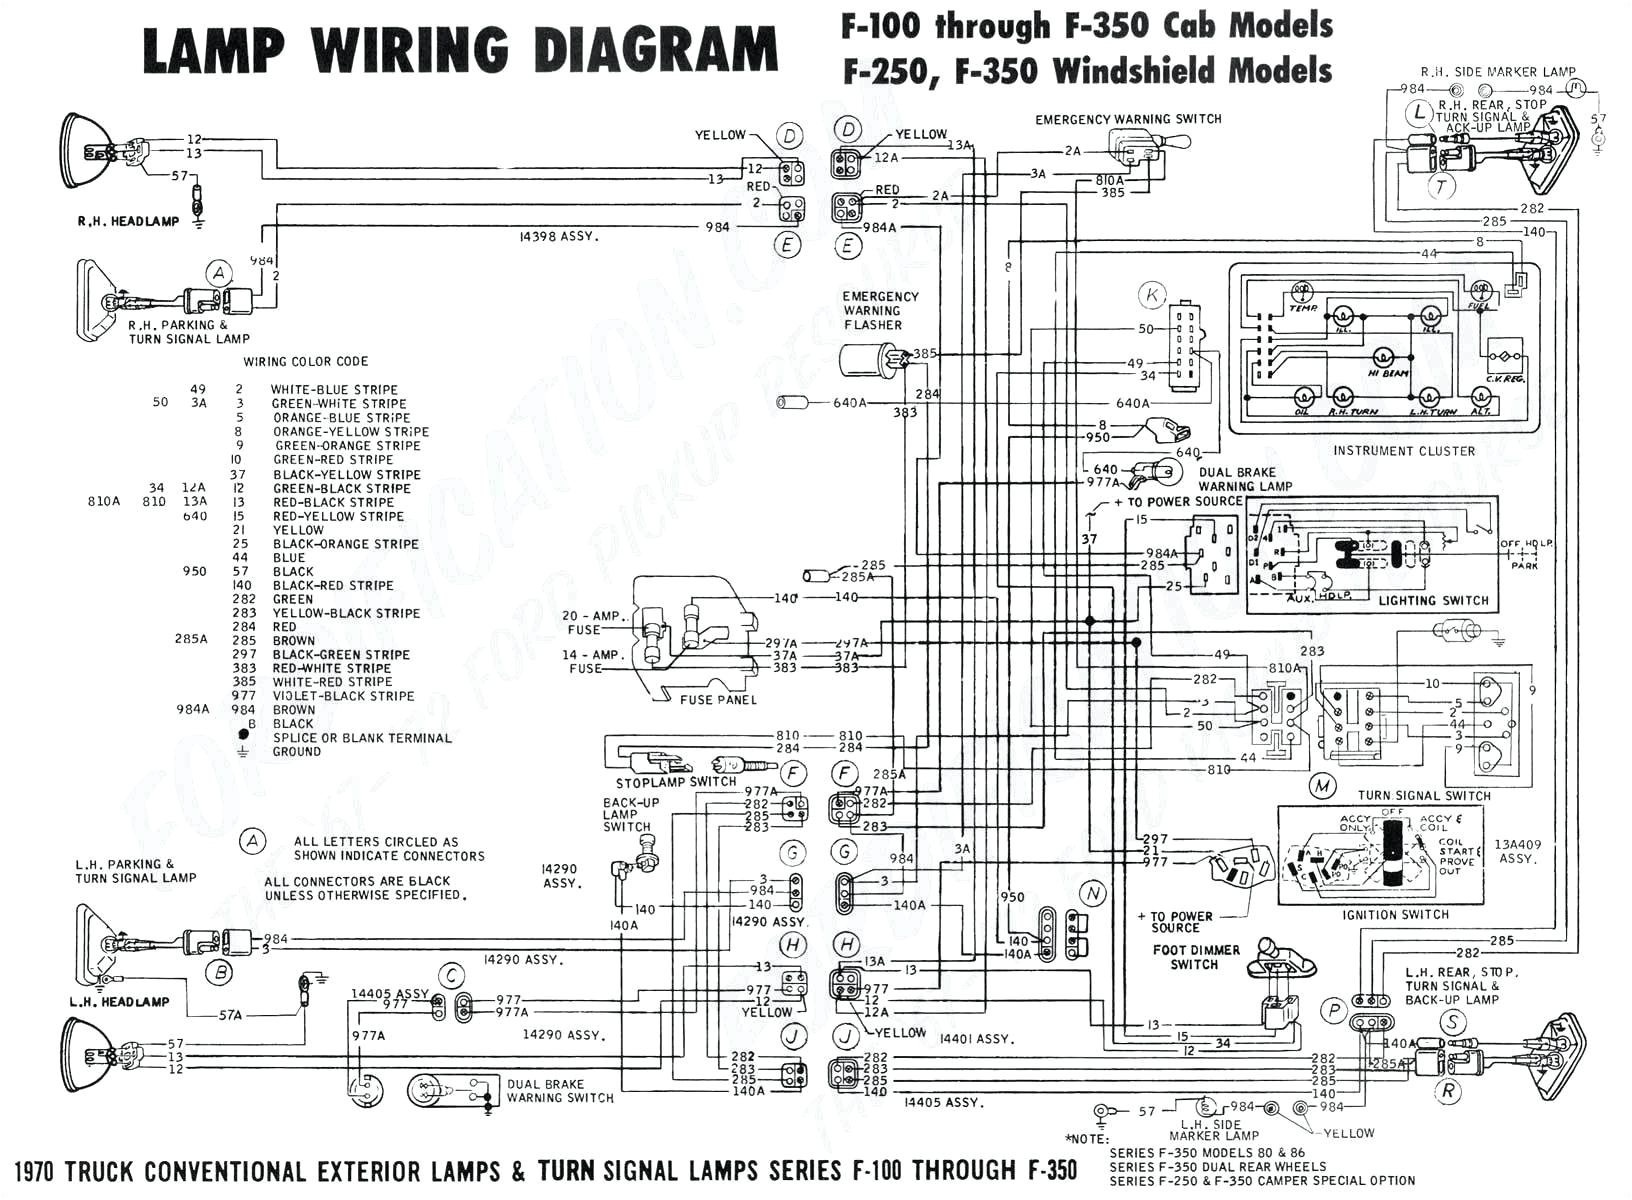 honda mtx 80 wiring diagram wiring diagram expert honda mtx 80 wiring diagram